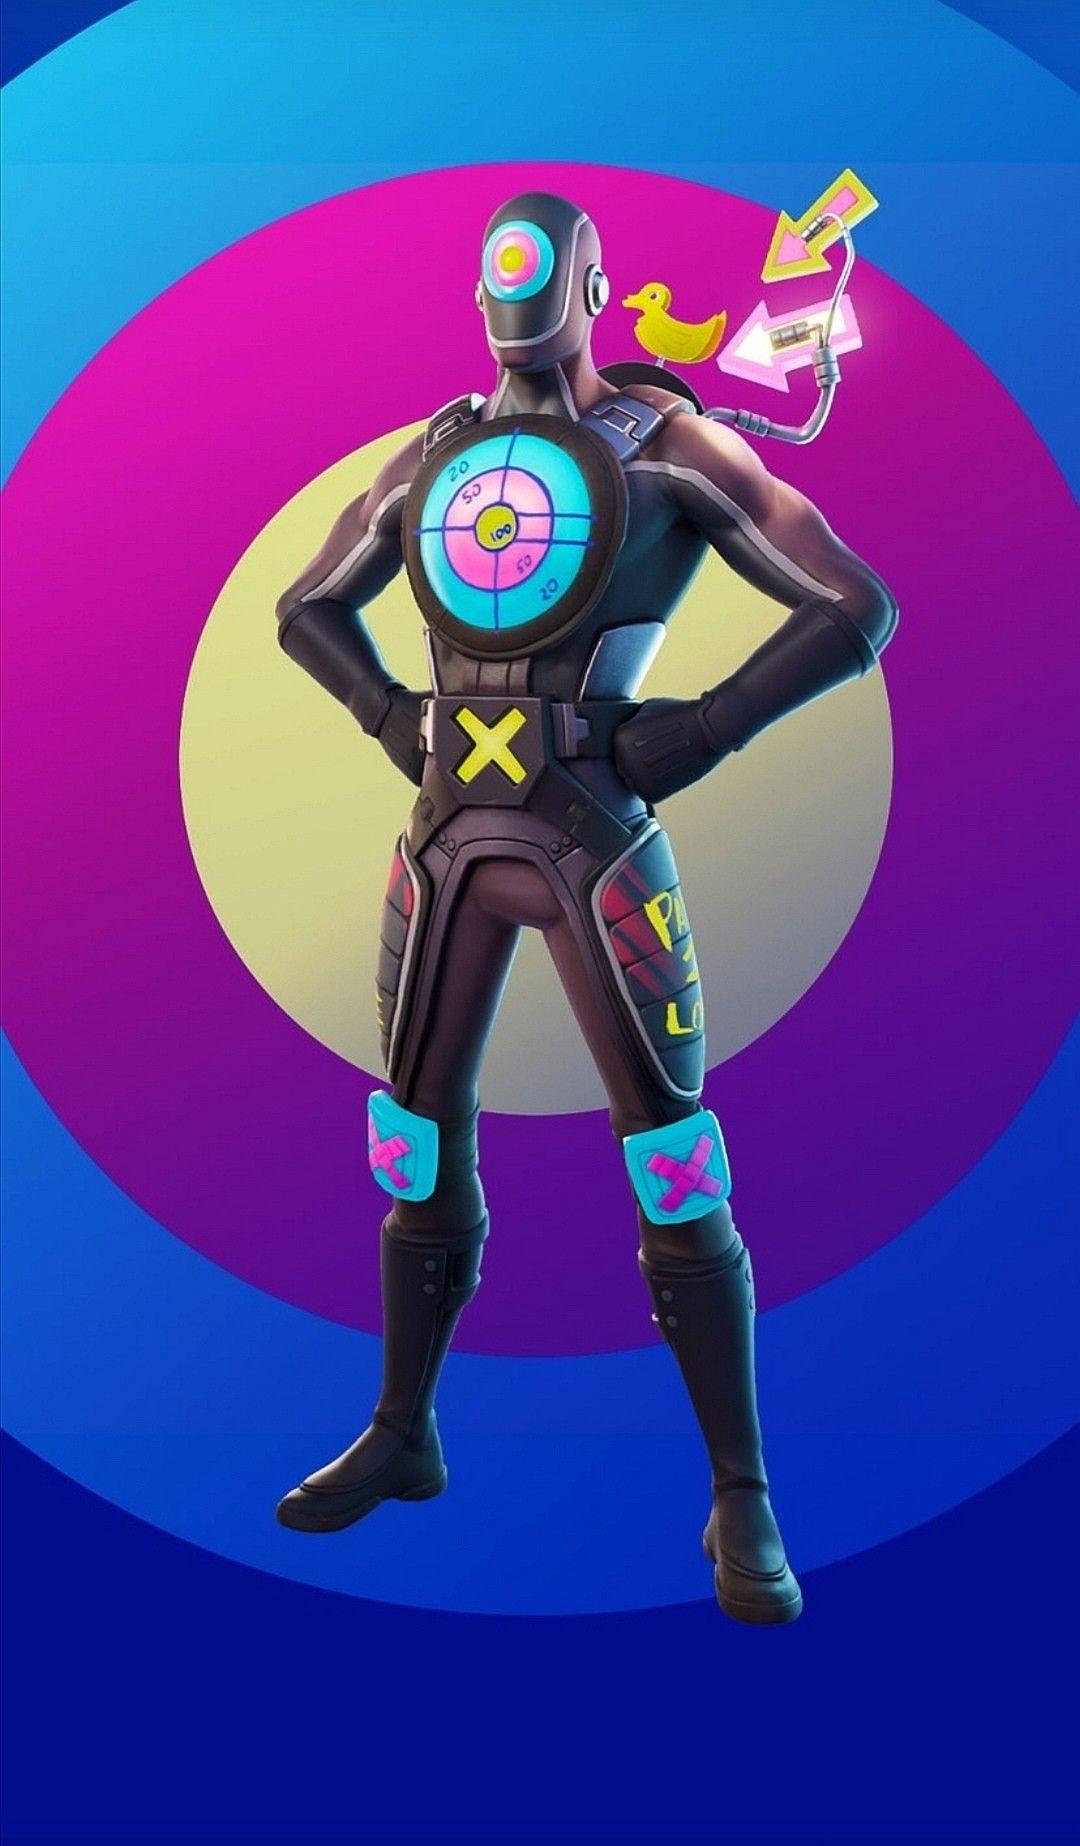 2020 Fortnite Fortnite Season 2 Chapter 2 Skins New Skins New In 2020 Graffiti Characters Character Design Epic Games Fortnite